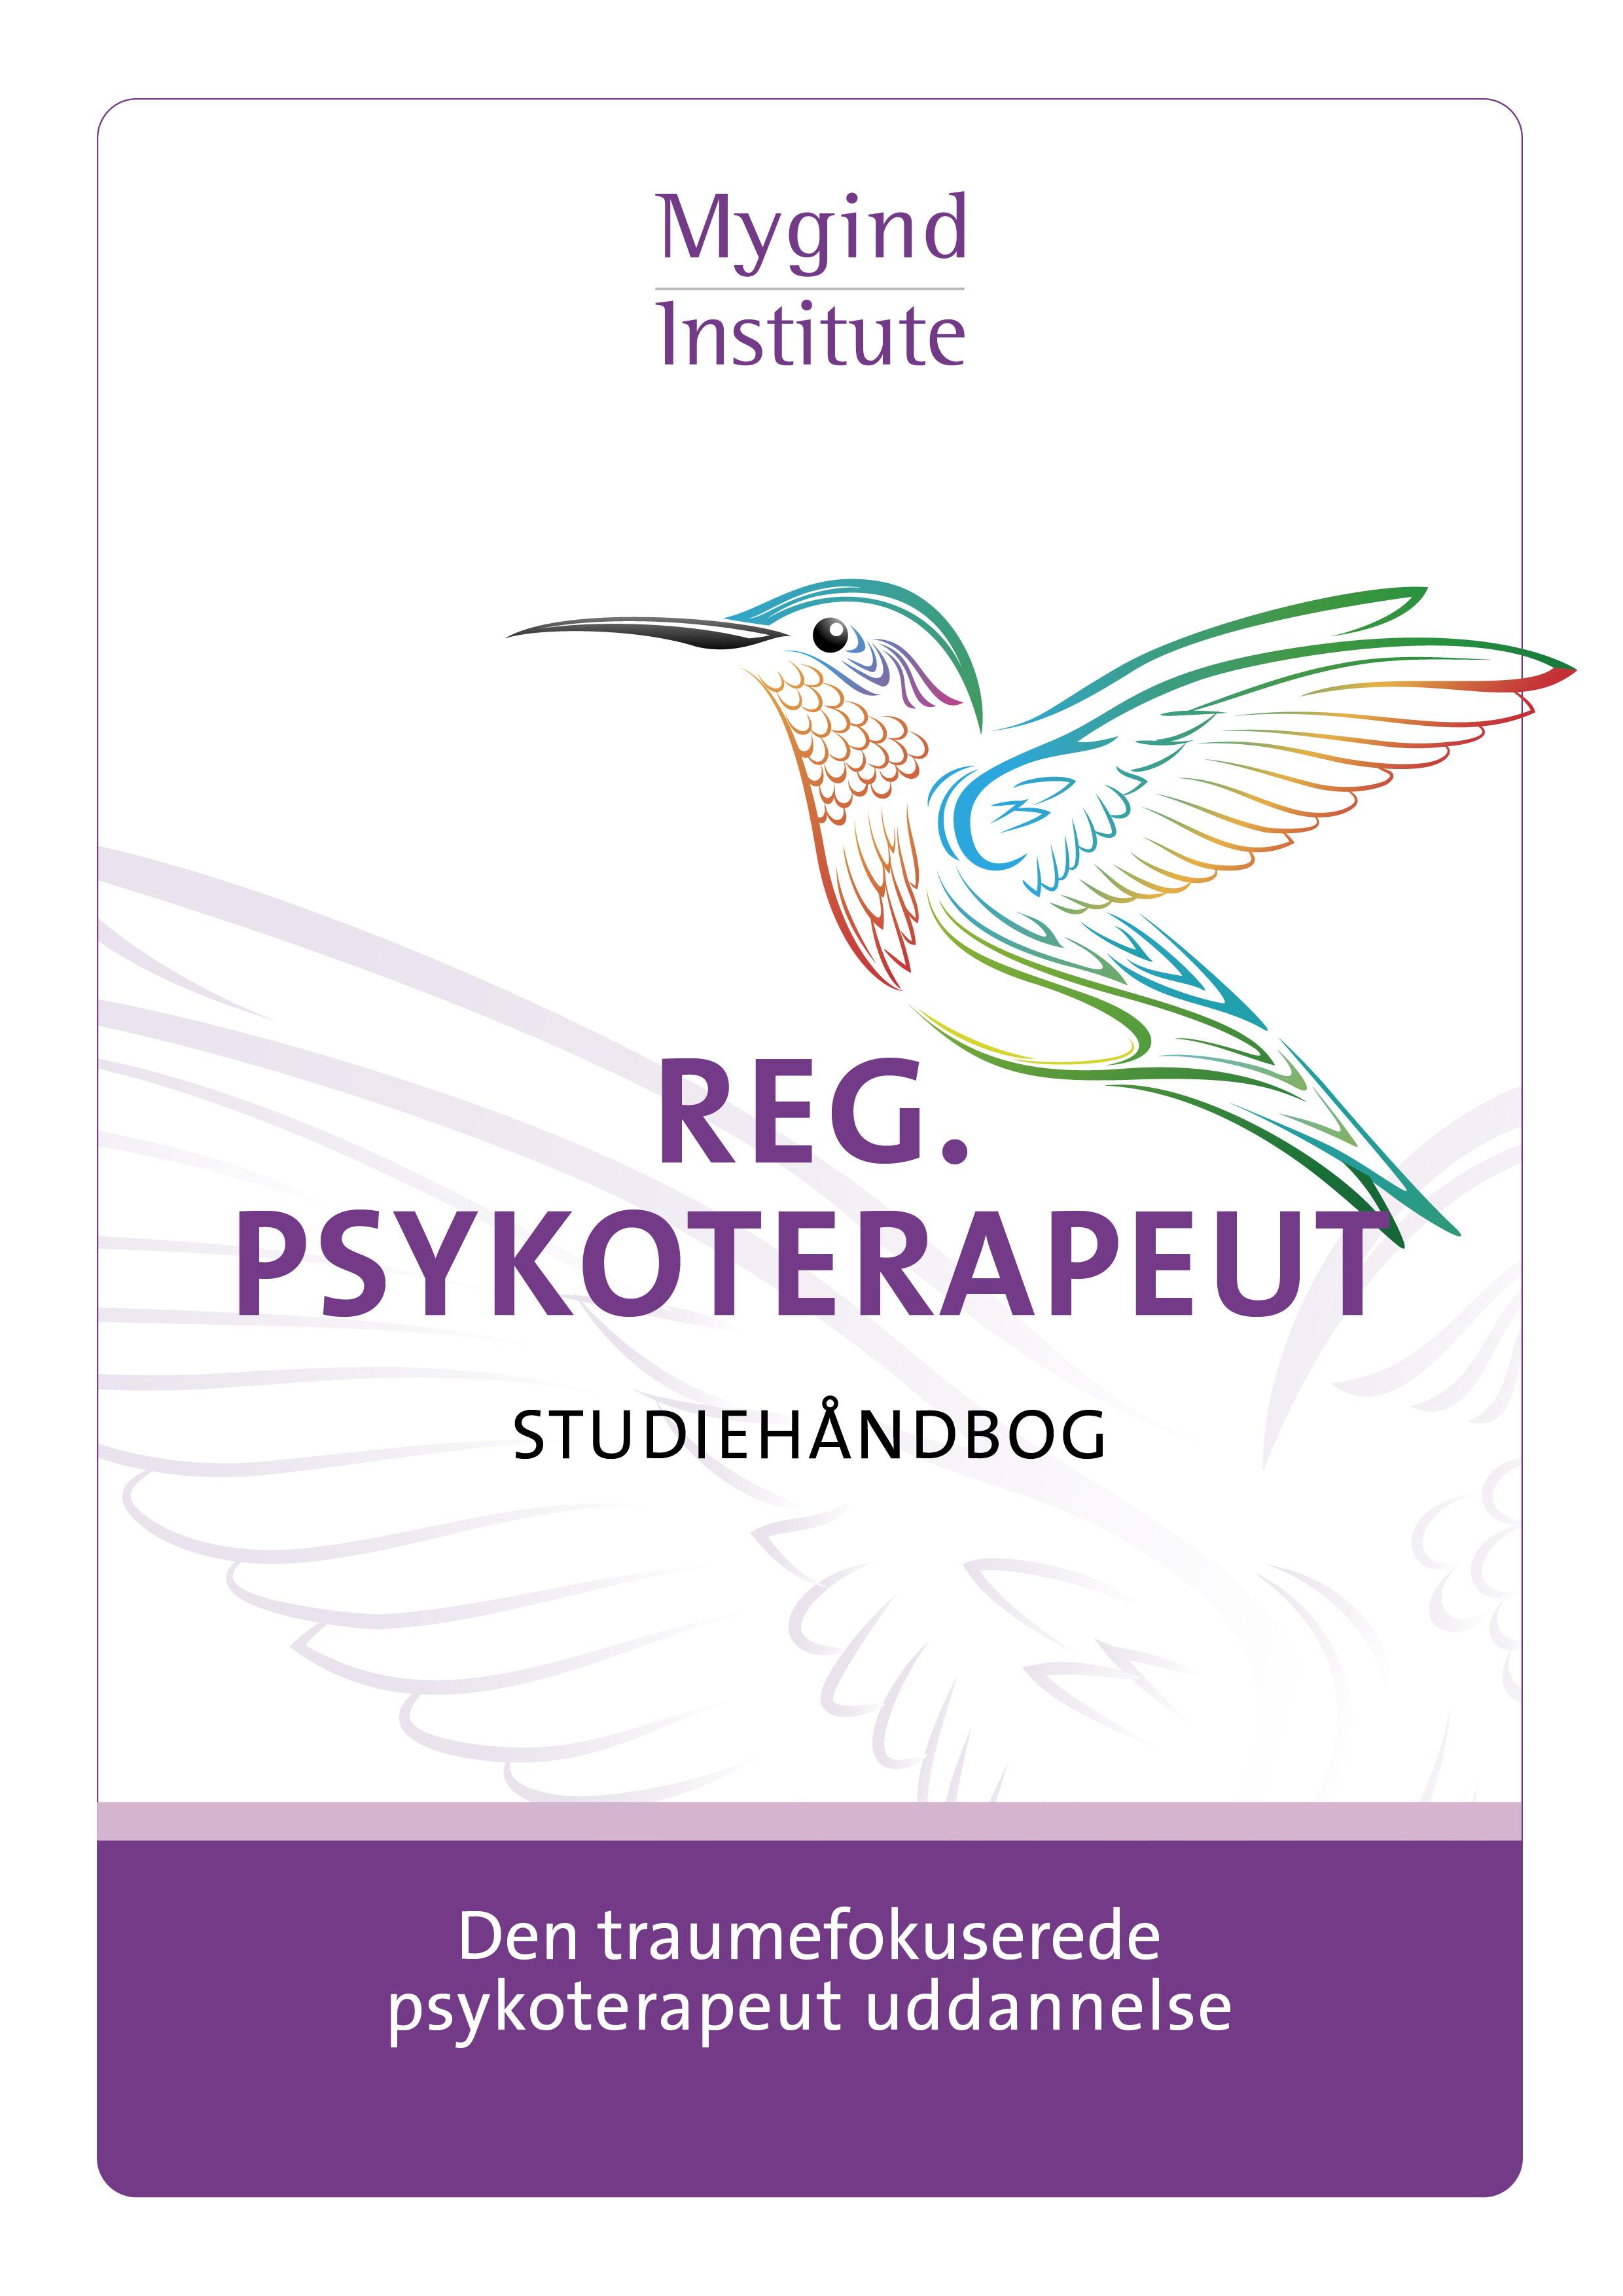 HM Psykoterapeut studiehåndbog 2020